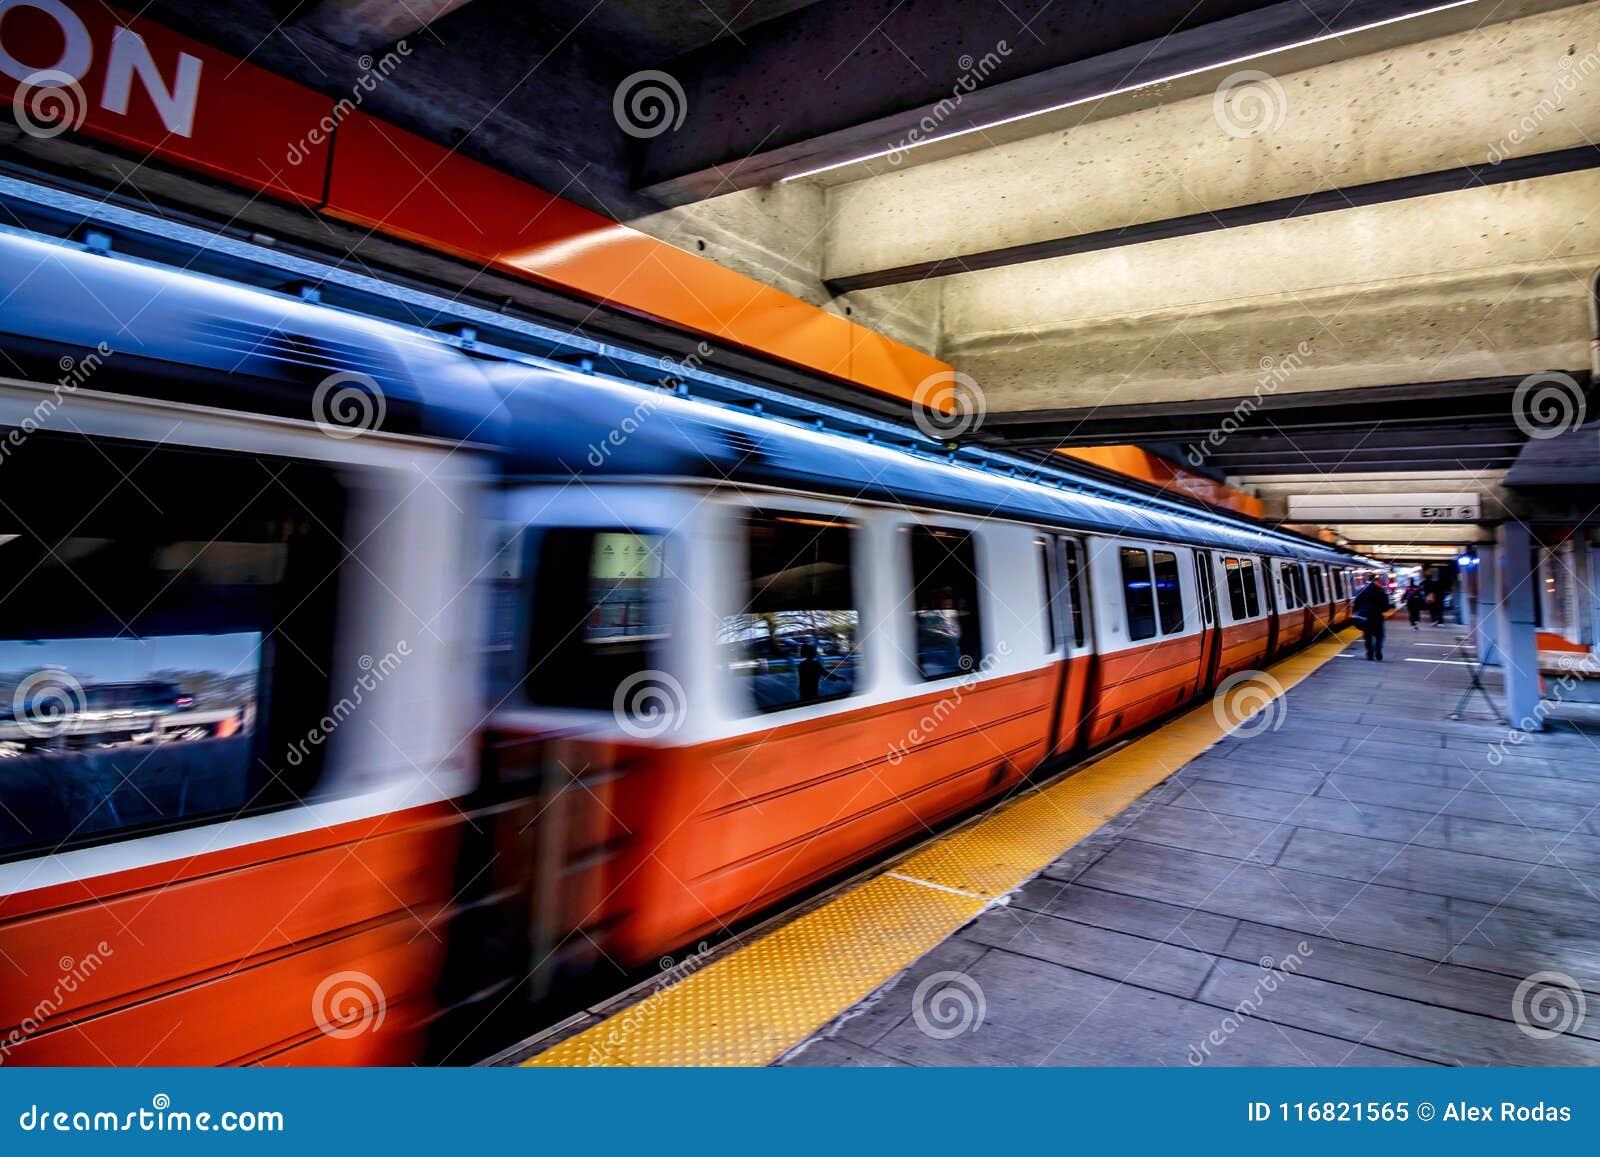 De Oranje Lijn van Wellington Train Station MBTA in Everett, Massachusetts